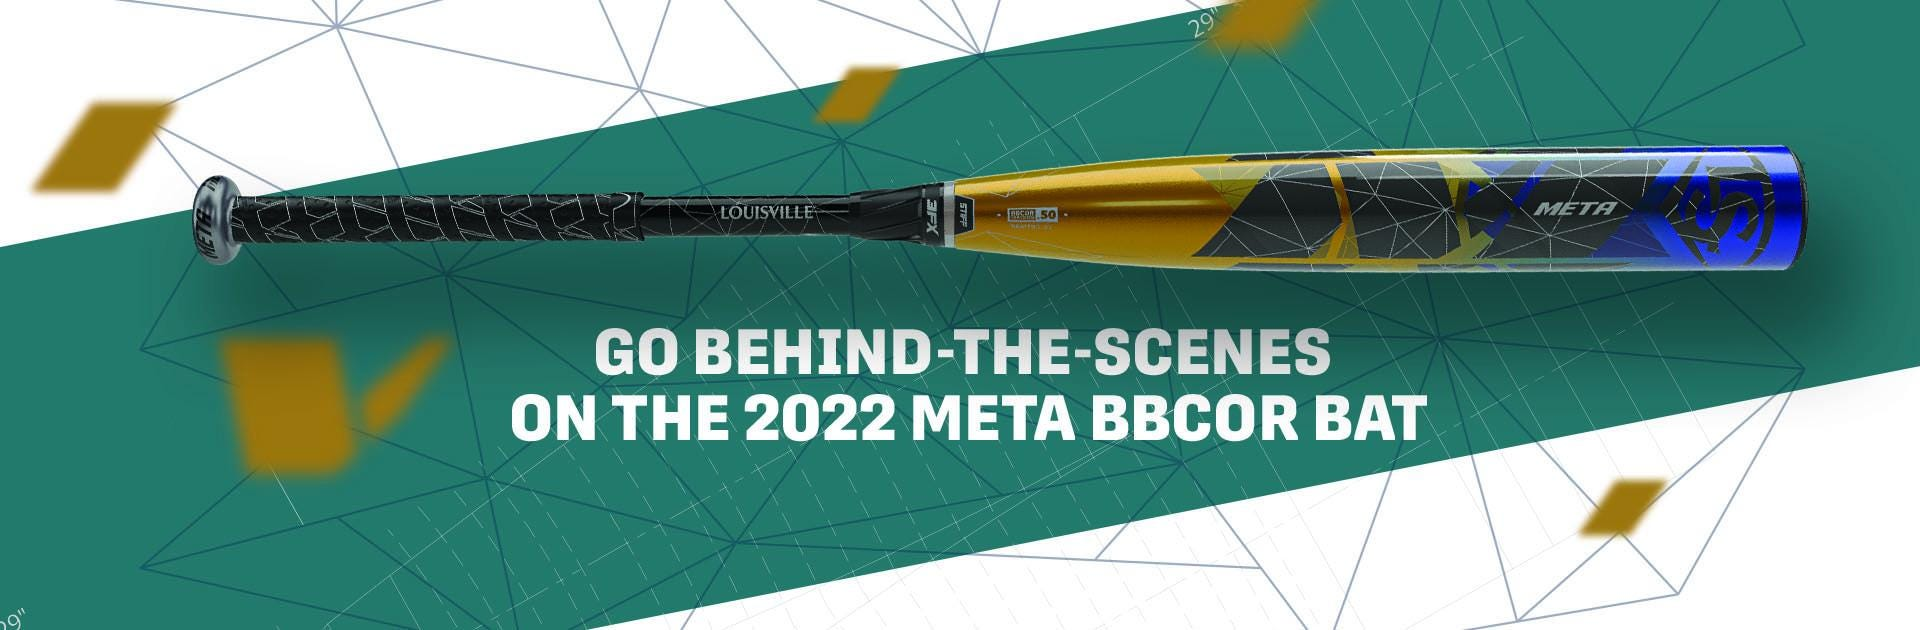 Louisville-Slugger-2022-Meta-BBCOR-Baseball-Bat-College-World-Series-Omaha